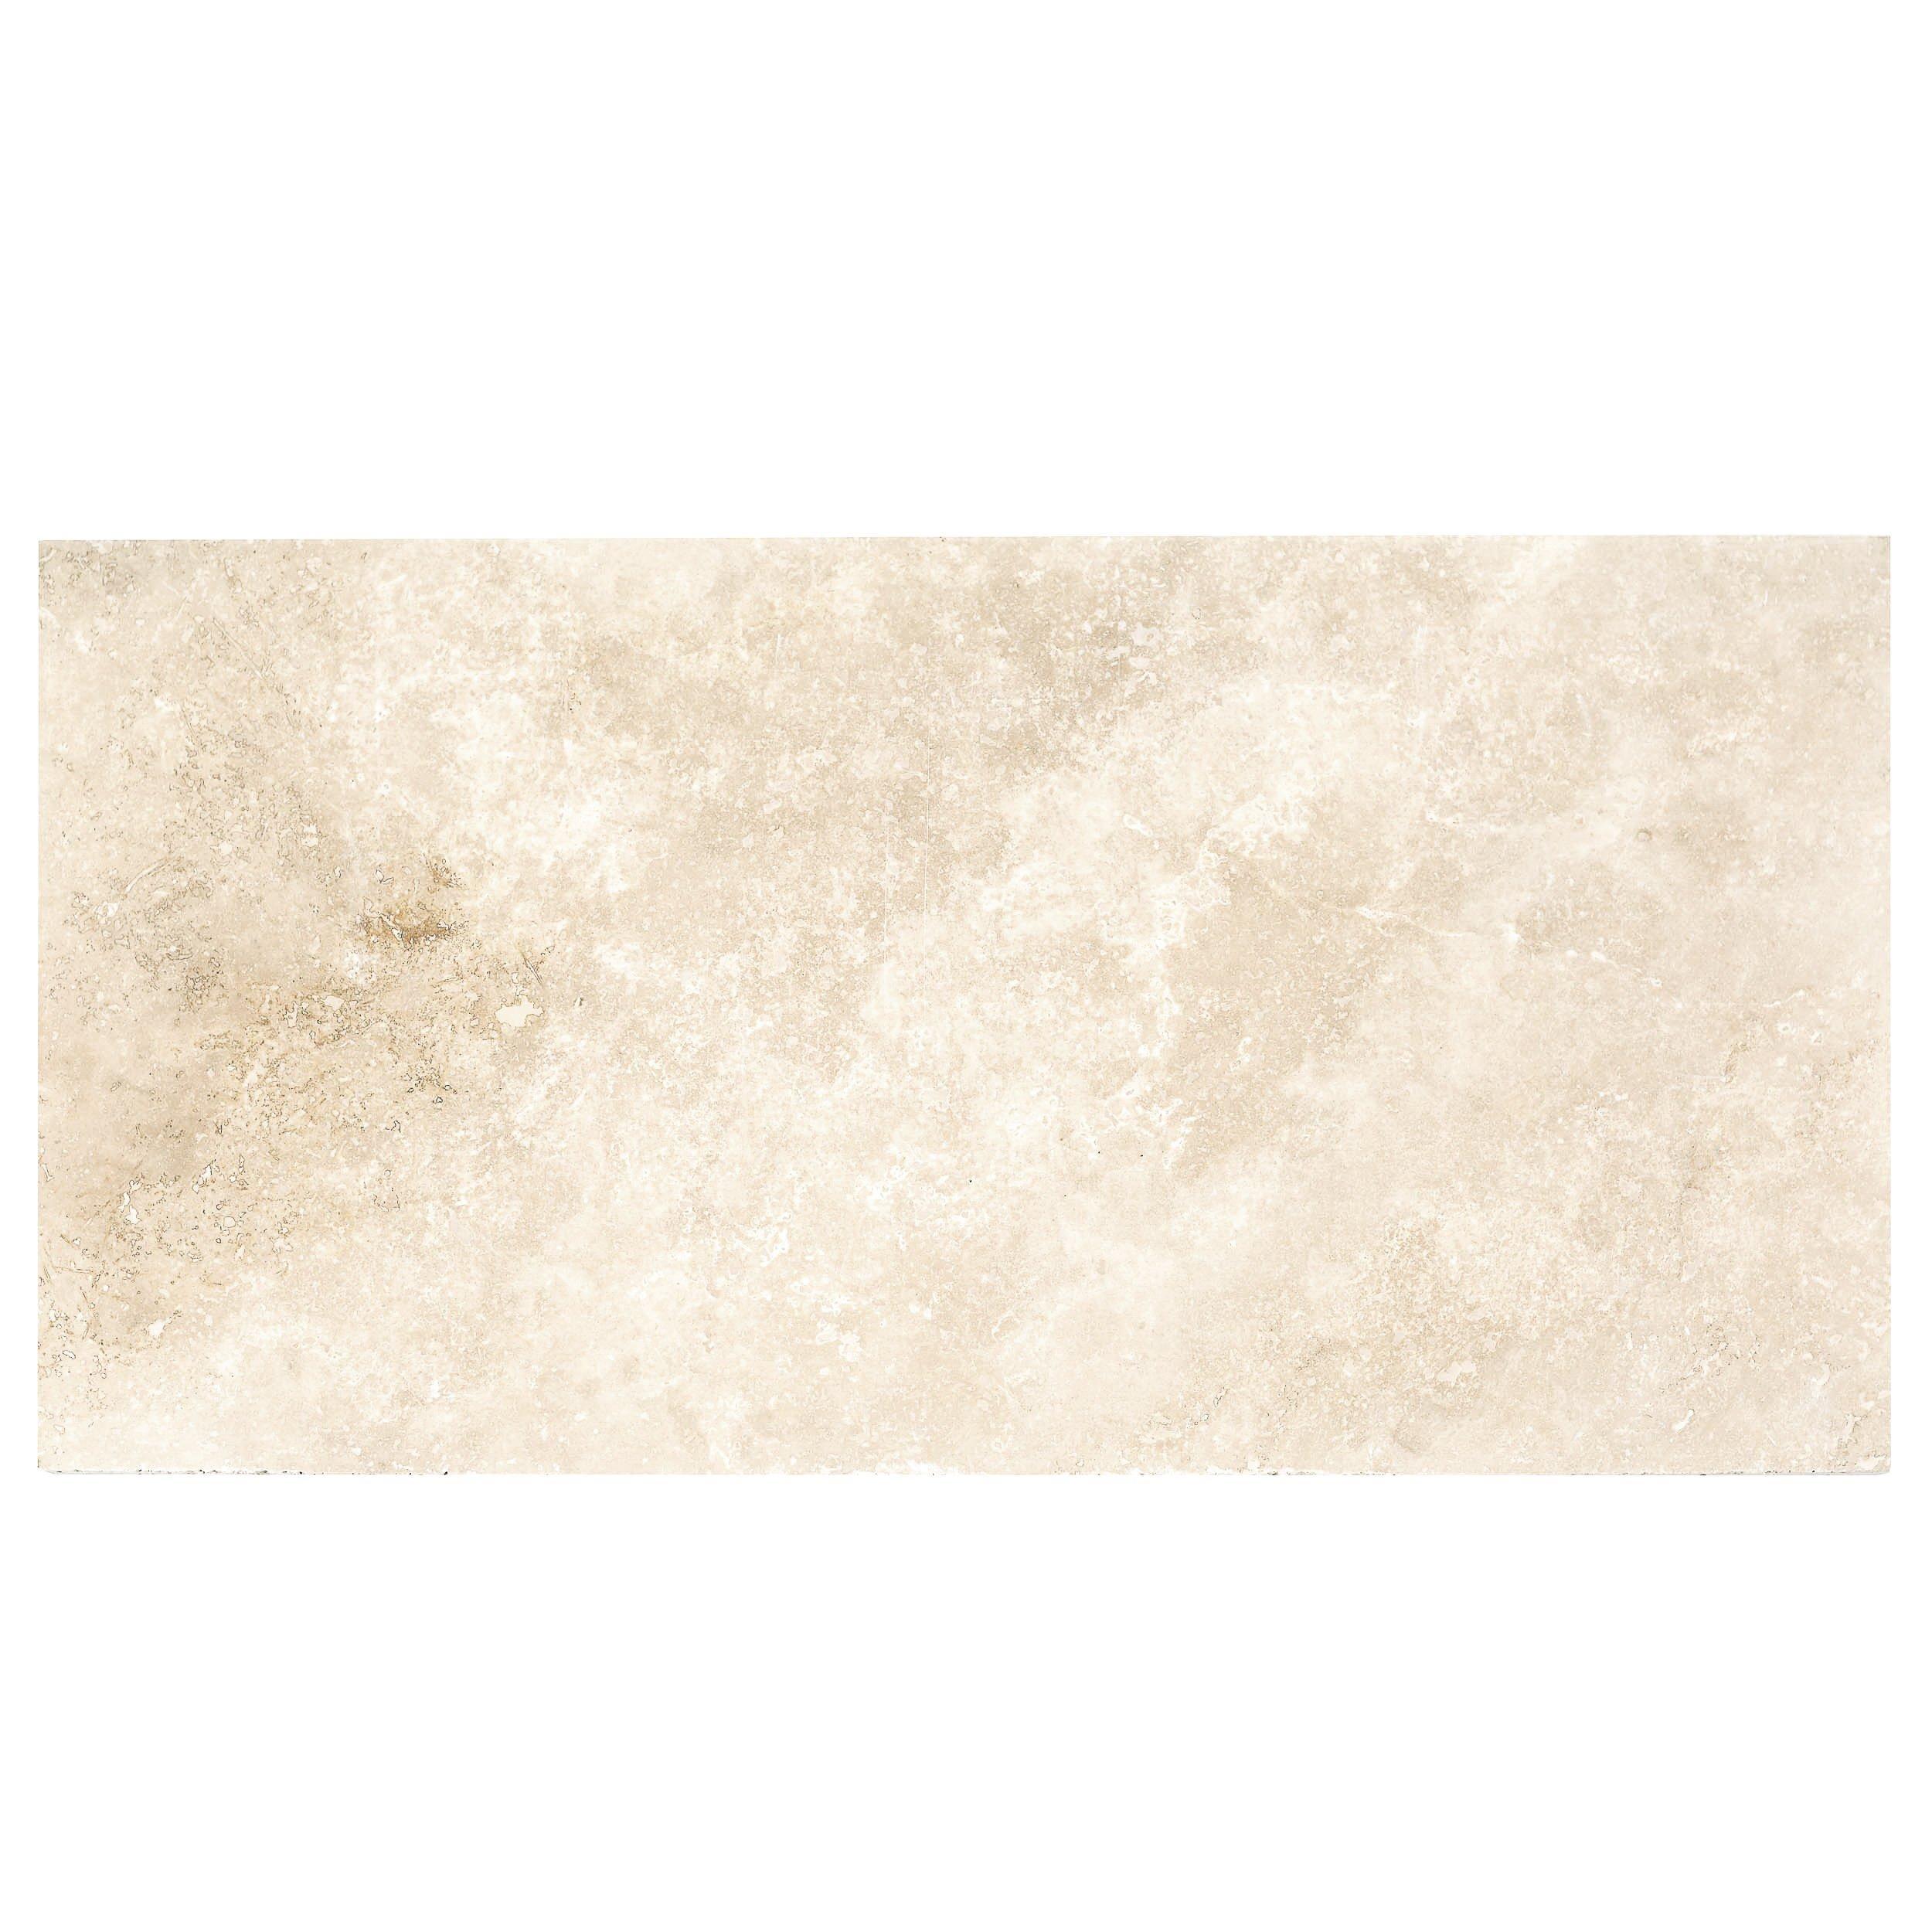 Antique Bergamo Honed Filled Travertine Tile In 2020 Travertine Travertine Tile Onyx Tile